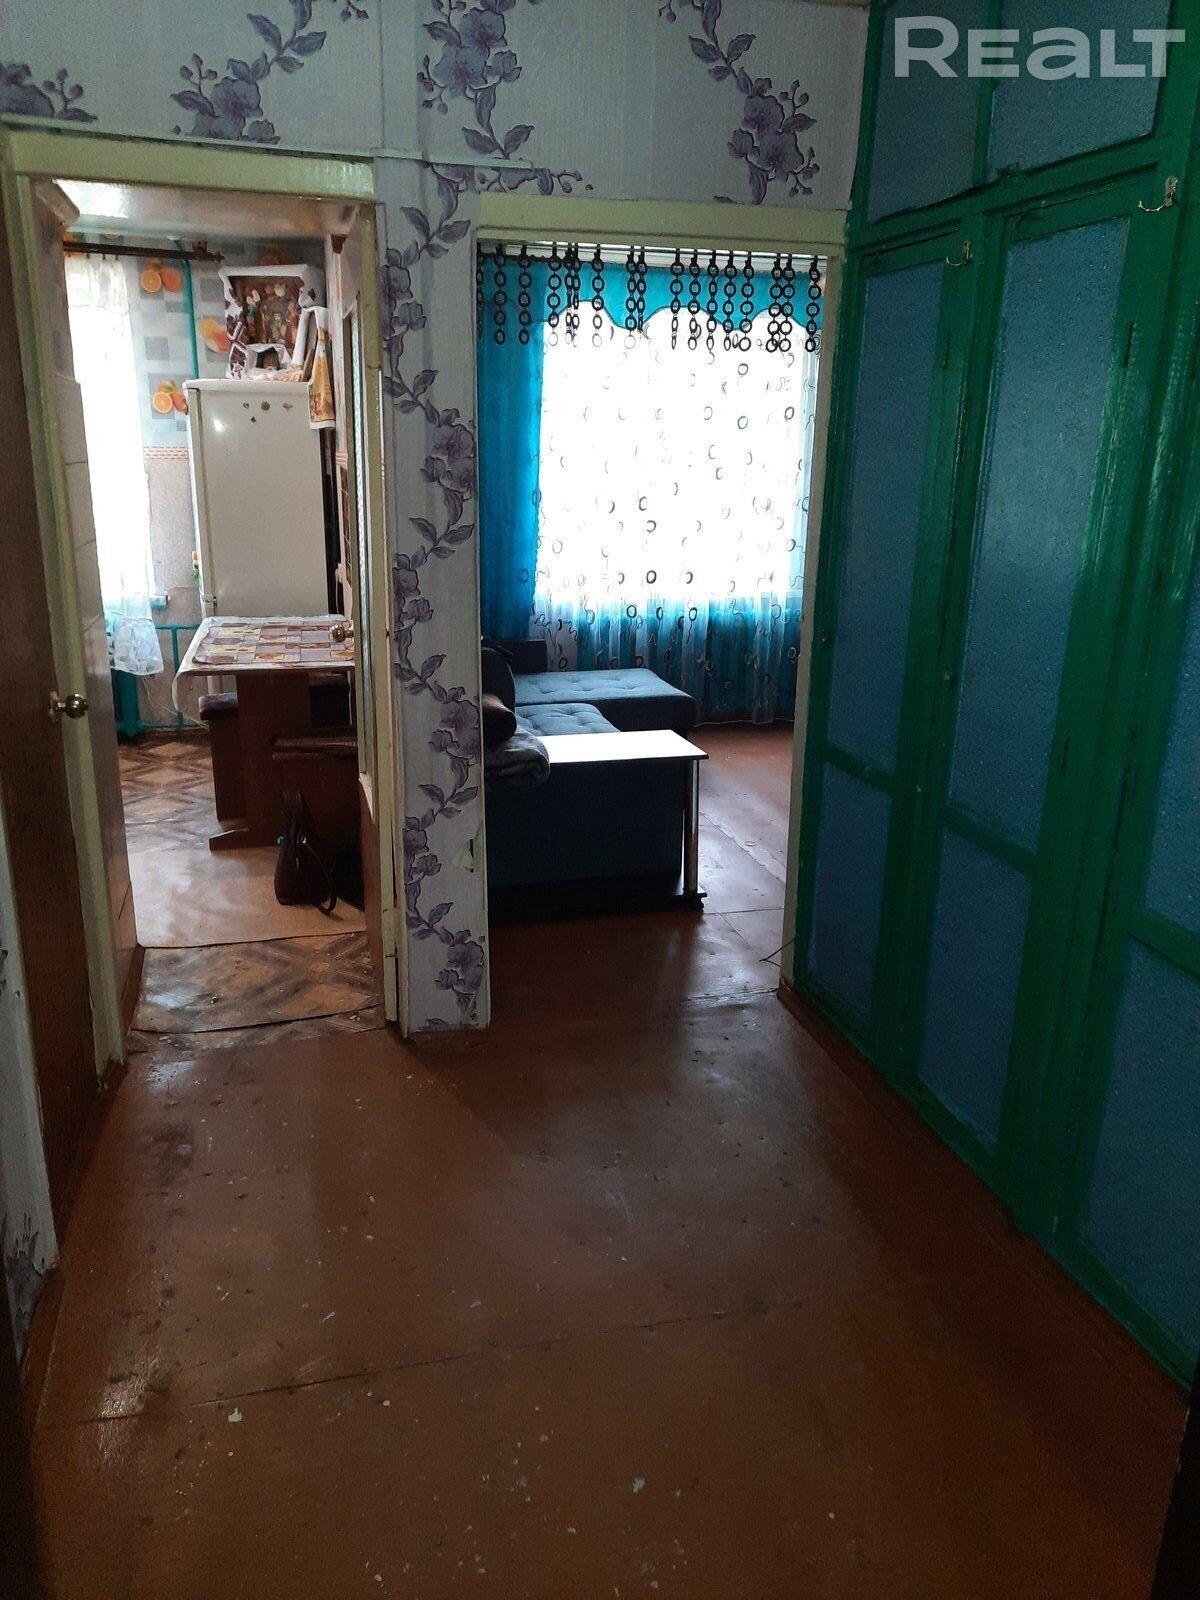 Продажа 1 комнатной квартиры в г. Ветке, ул. Батракова, дом 23-a. Цена 29 053 руб